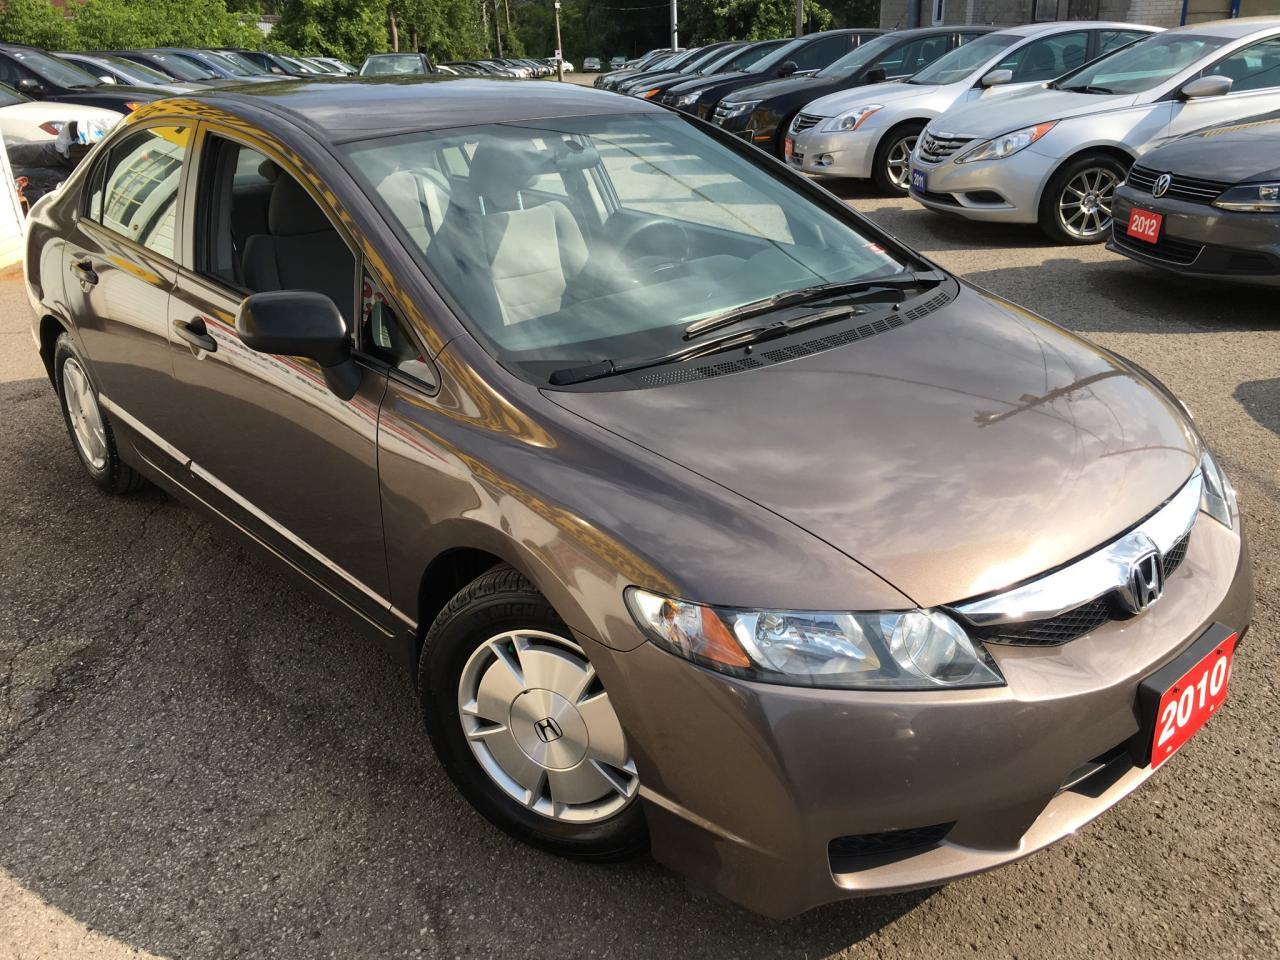 2010 Honda Civic DX-G/AUTO/ALLOYS/CHEAP ON GAS/DRIVES LIKE NEW